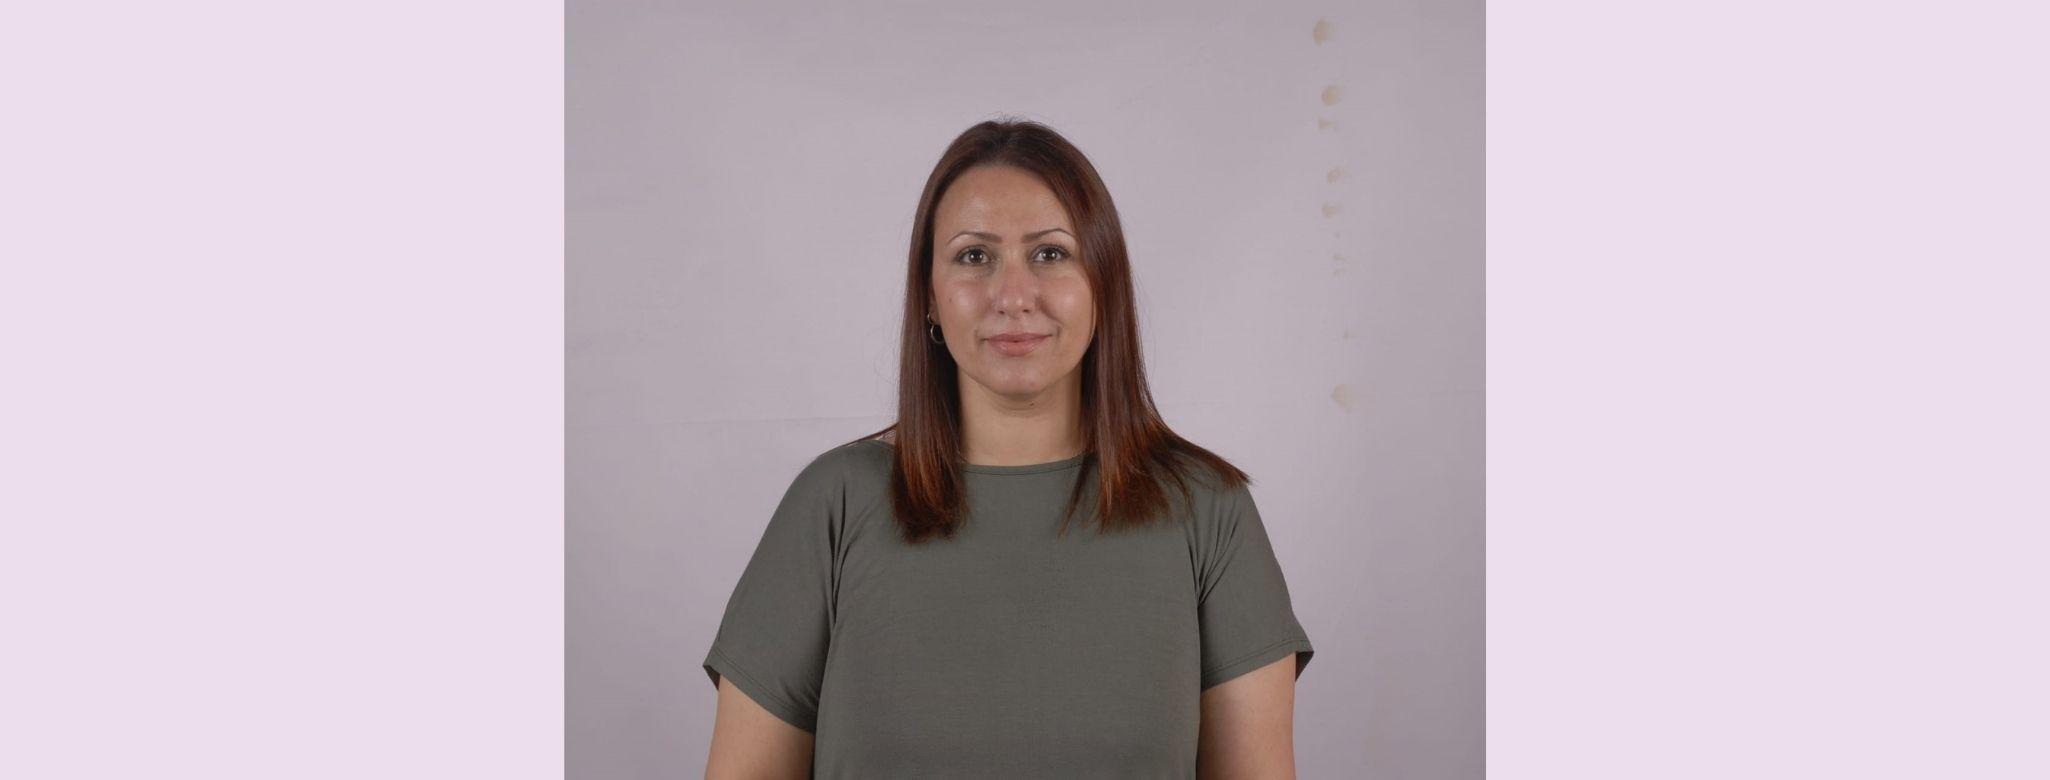 Catarina Peniche é a candidata do Bloco de Esquerda à Assembleia Municipal de Vila Real